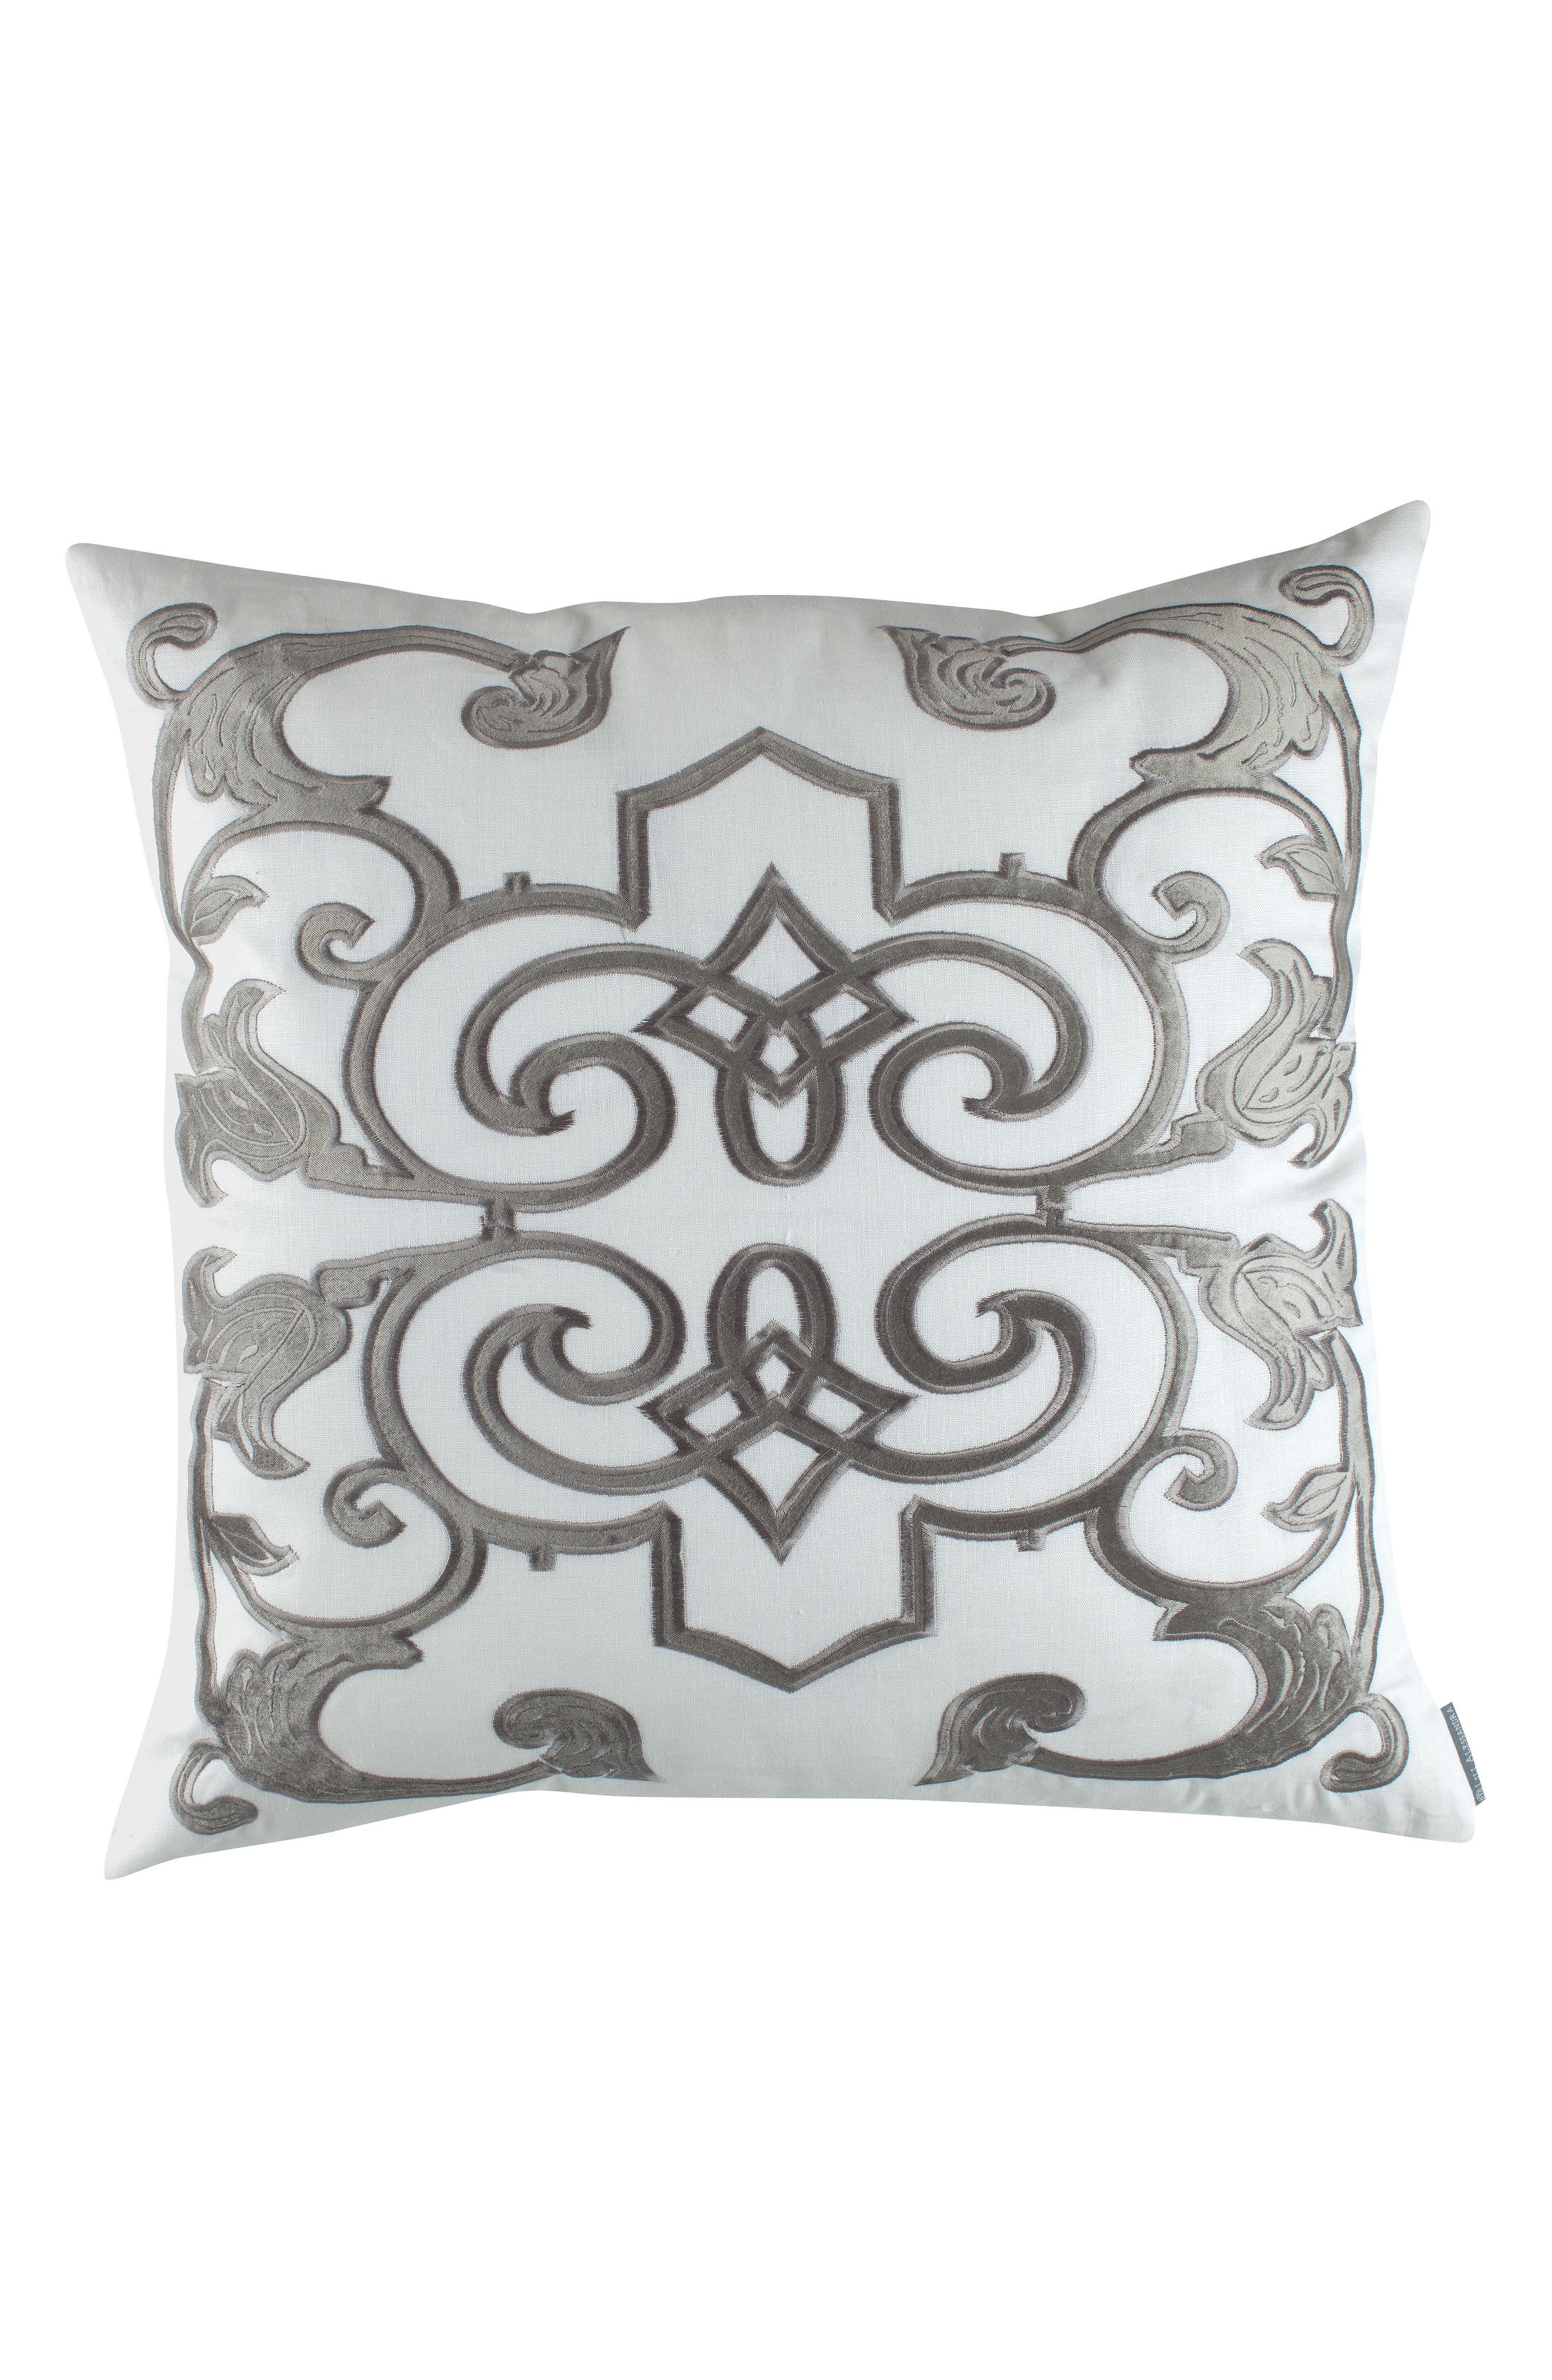 Lili Alessandra Mozart Accent Pillow